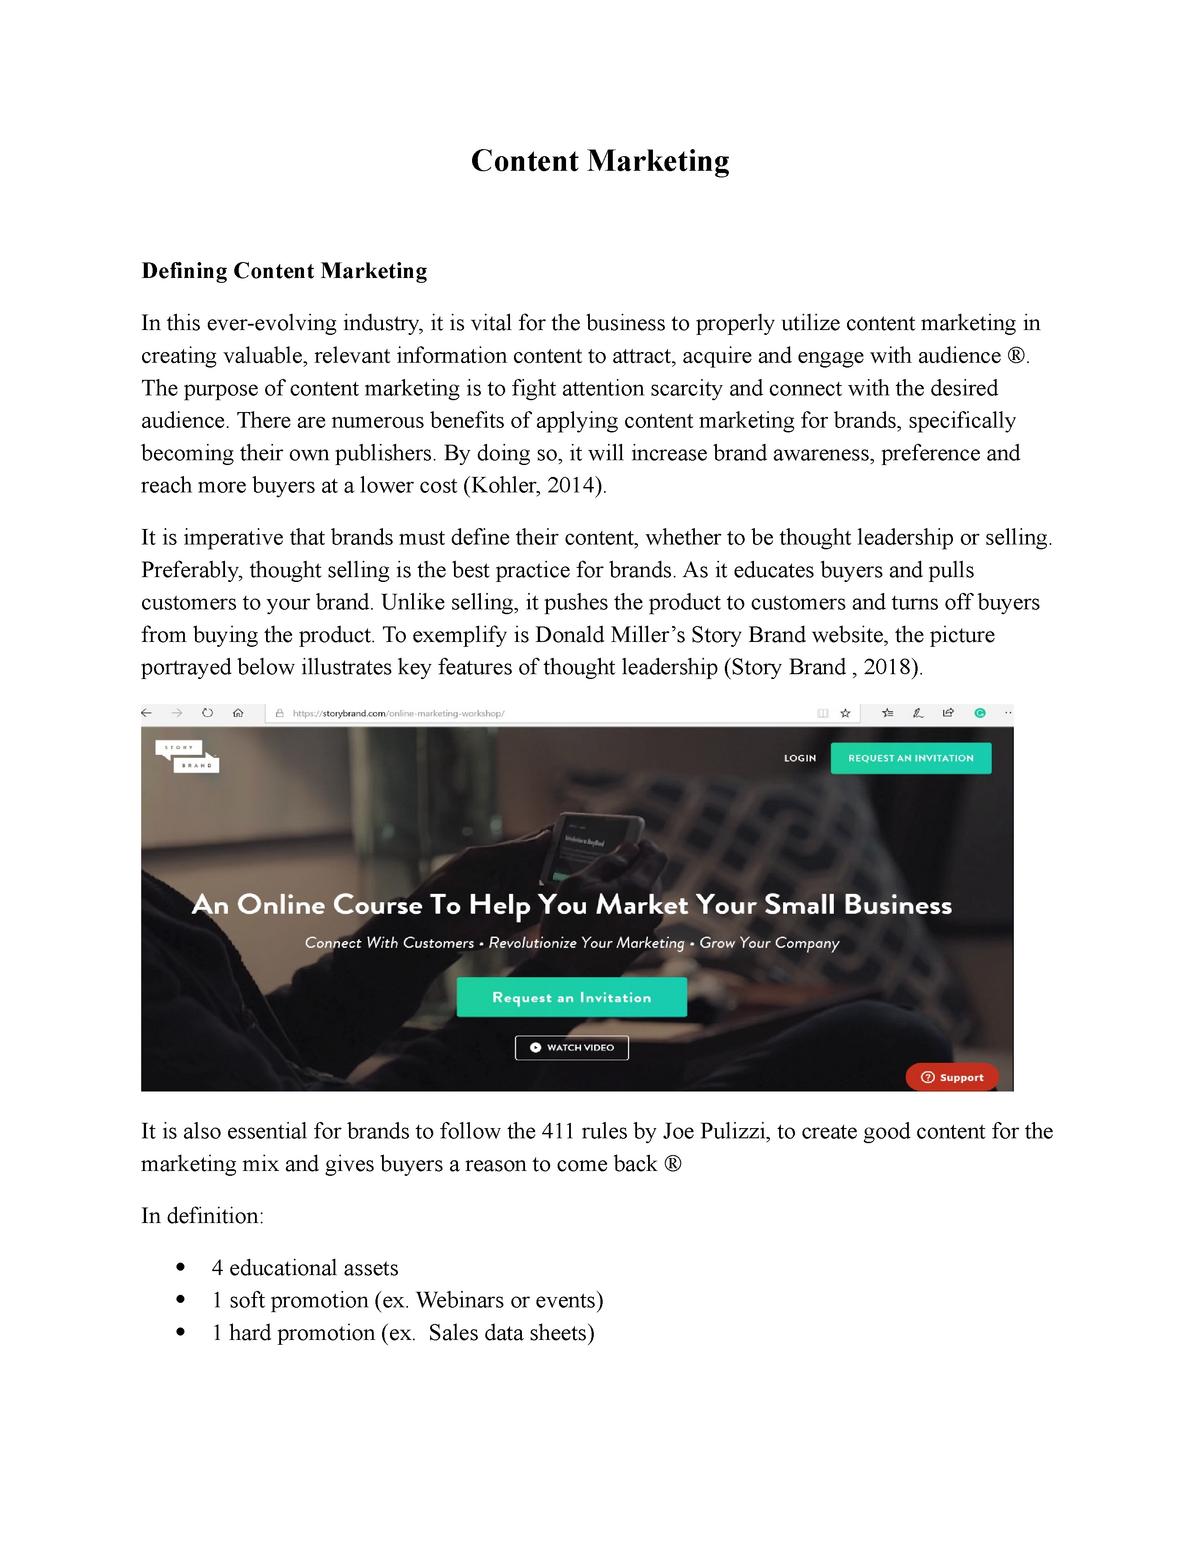 Content Marketing - Summary of Lynda Videos - MARK4474 - StuDocu